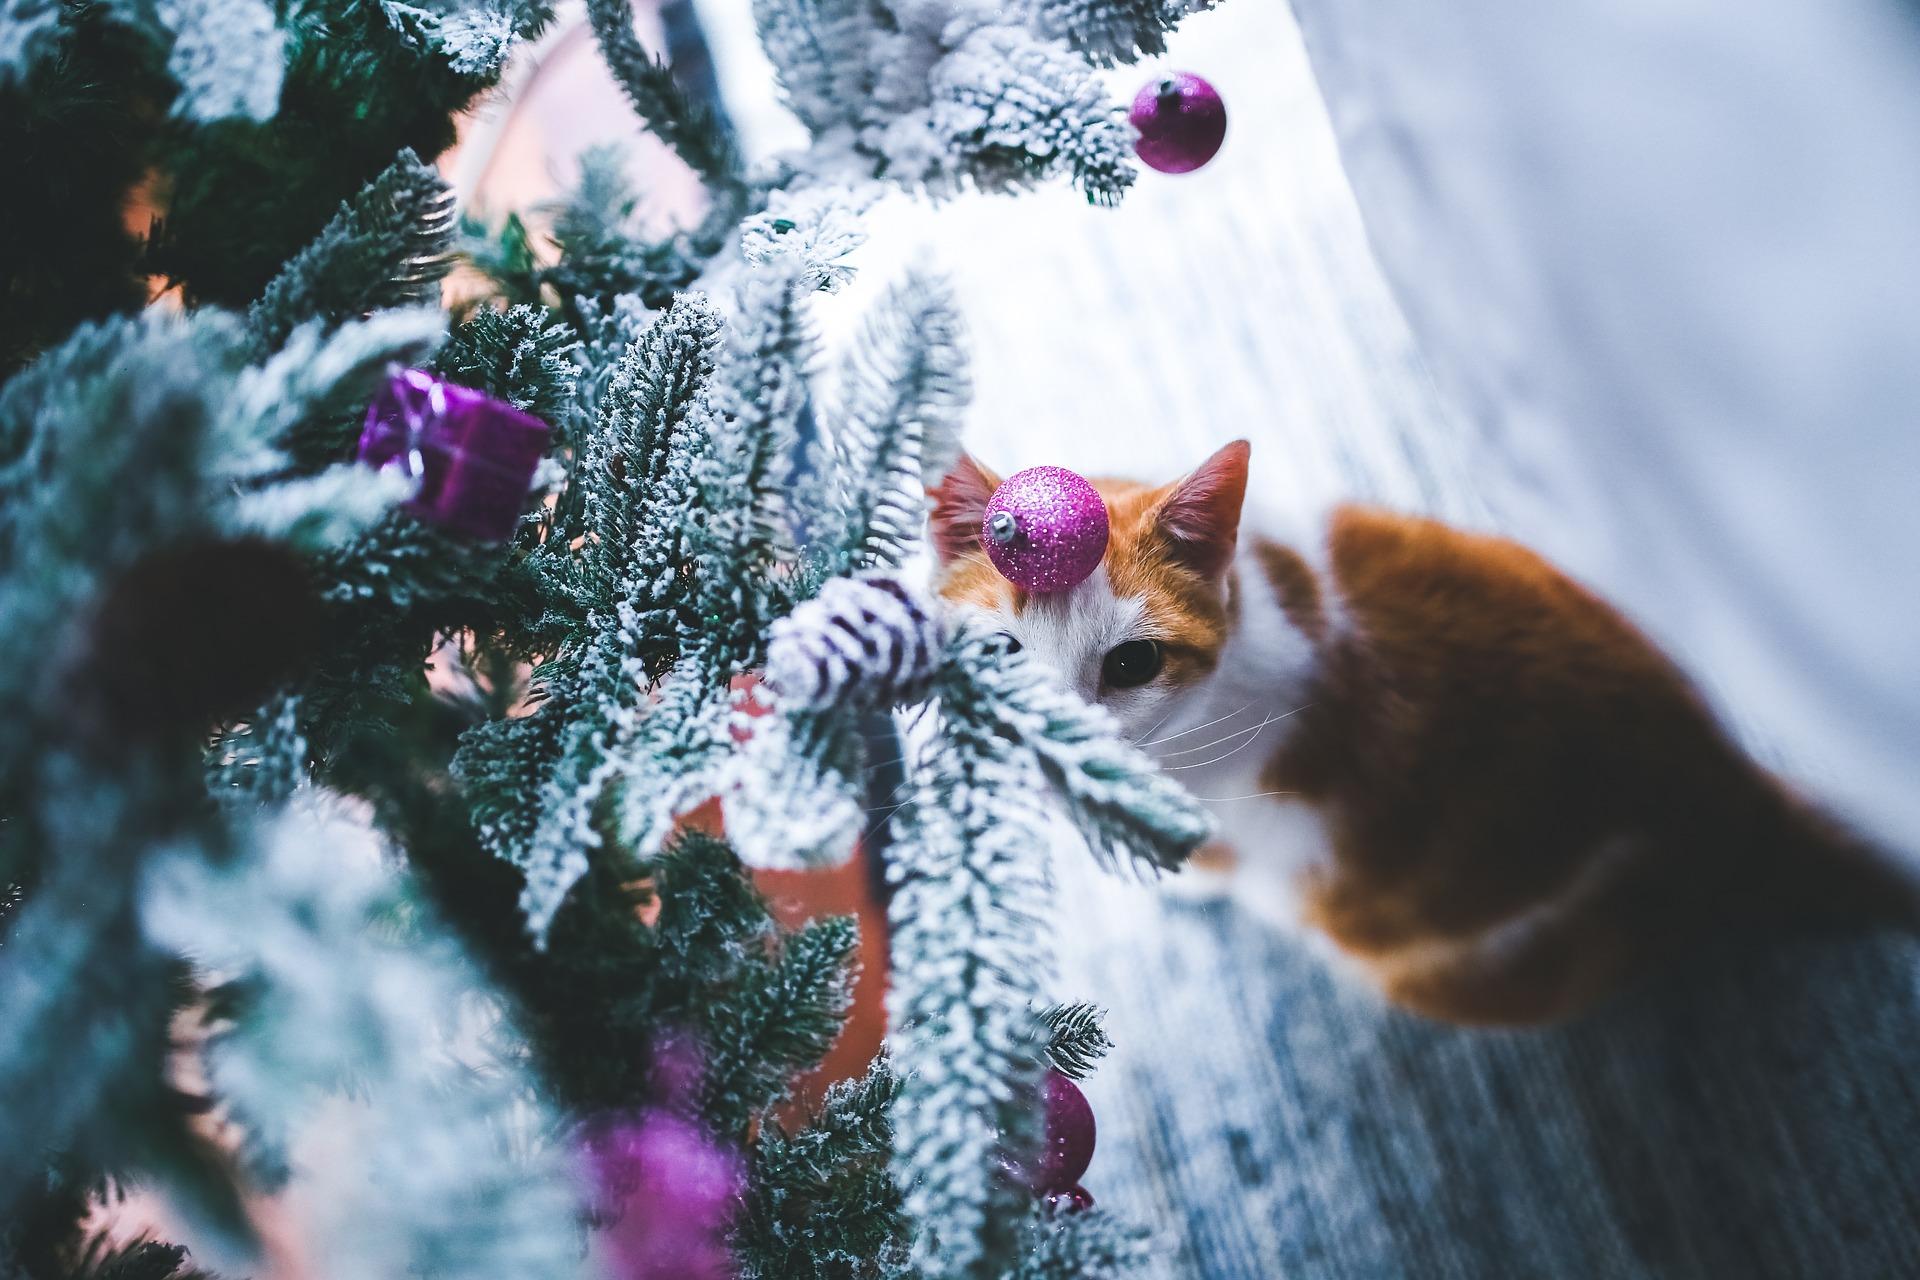 10 reasons why I love Christmas